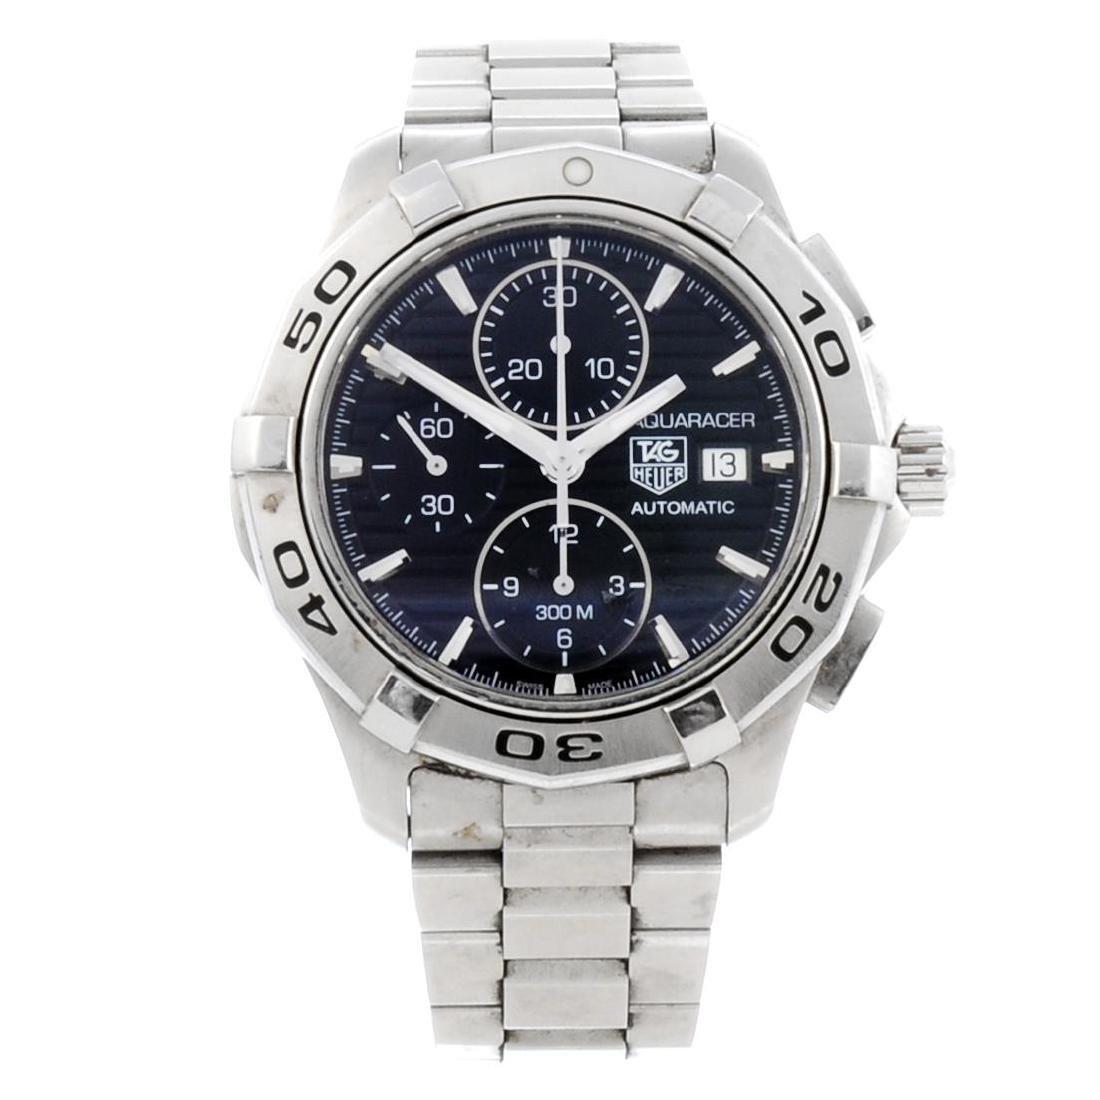 TAG HEUER - a gentleman's Aquaracer chronograph